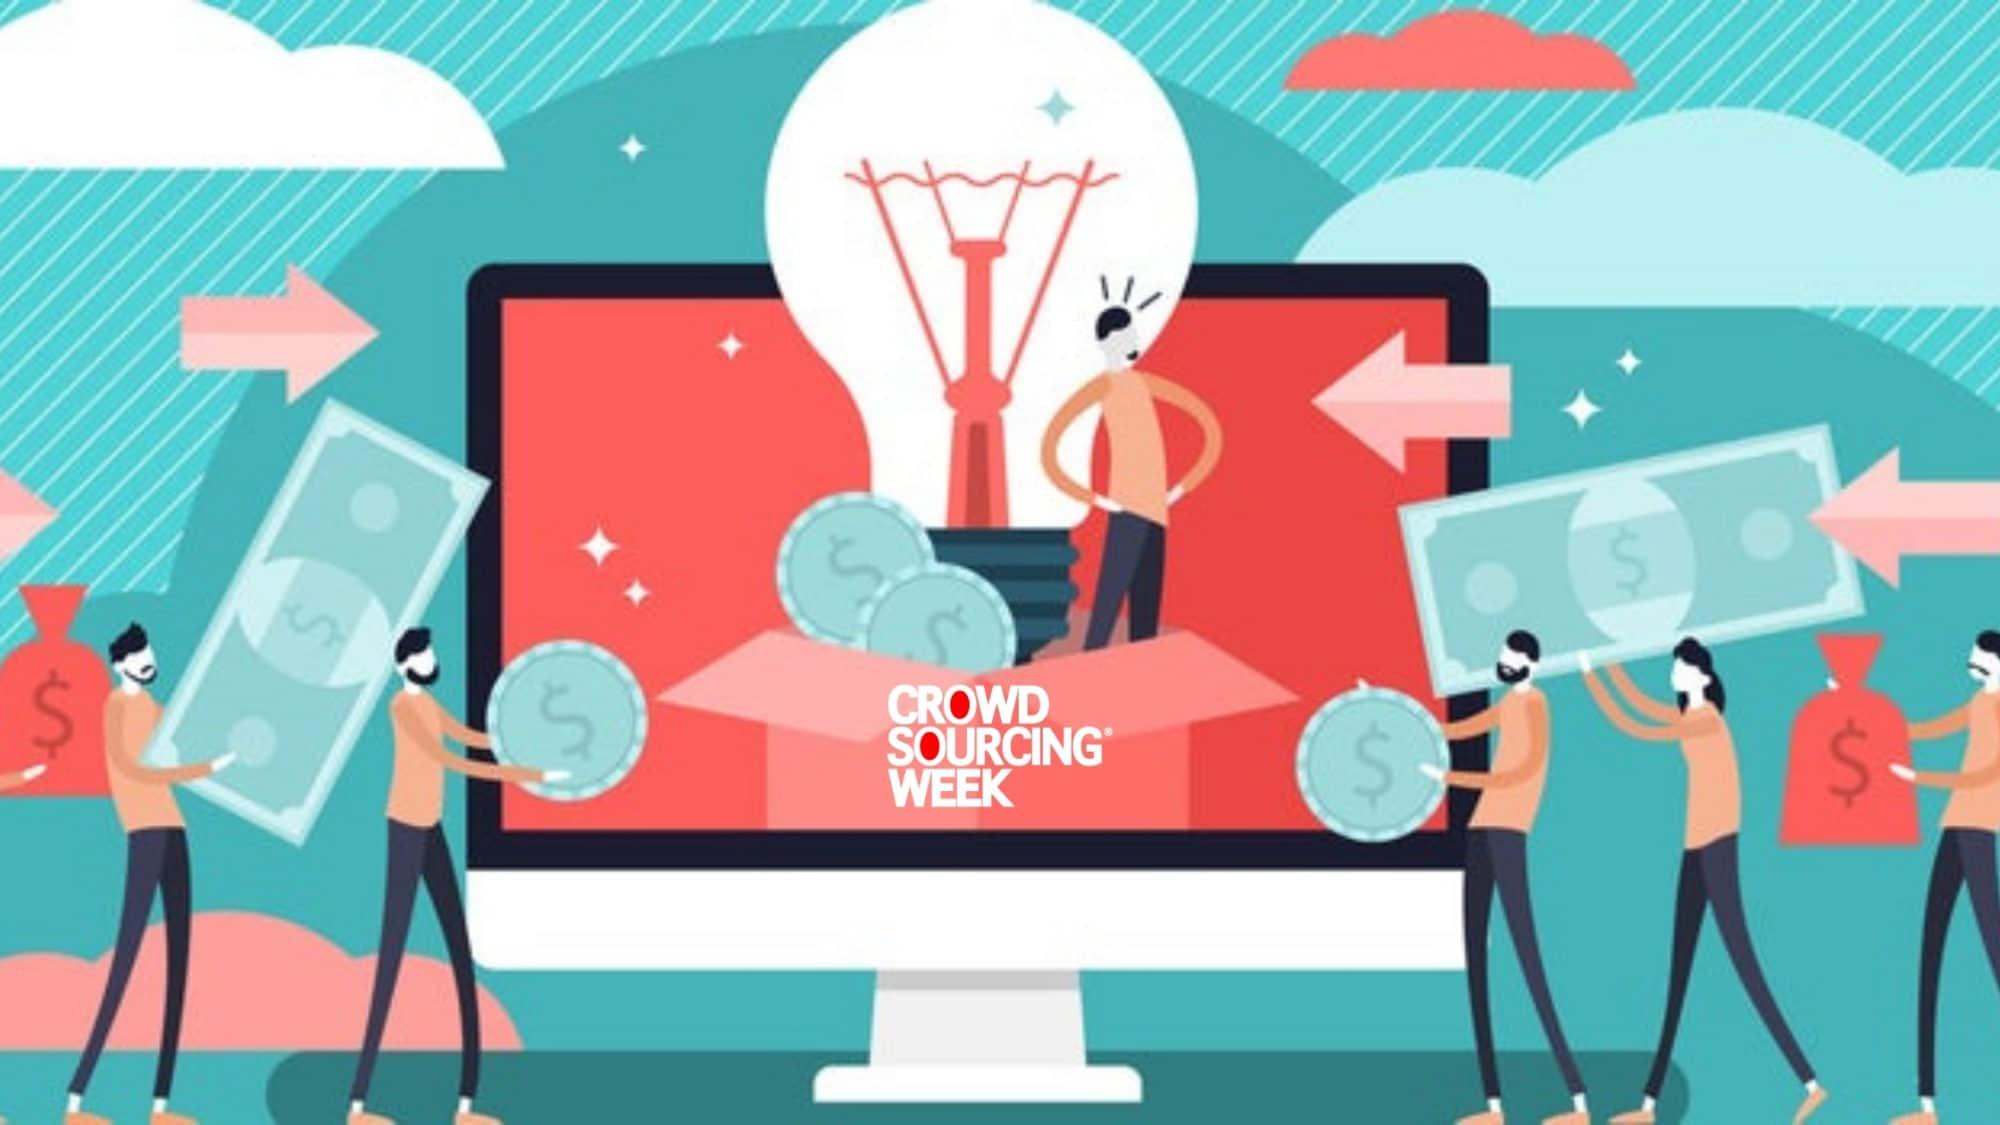 Best Ways to Boost Reward Crowdfunding Success - 8 Key Considerations